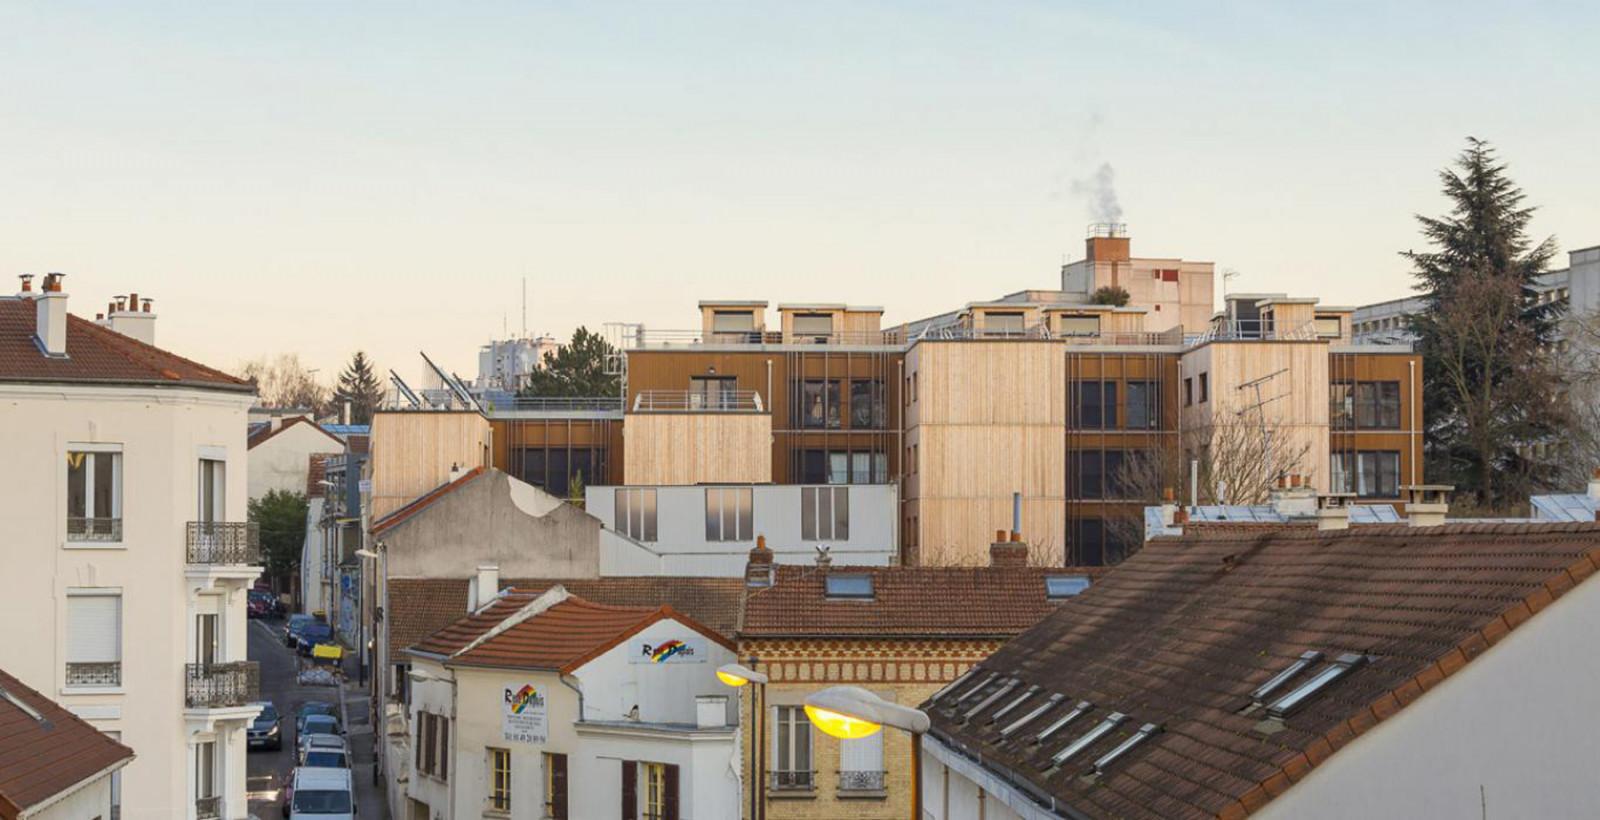 graam-fonderie-01-logements-montreuil-ville-toit-horizon